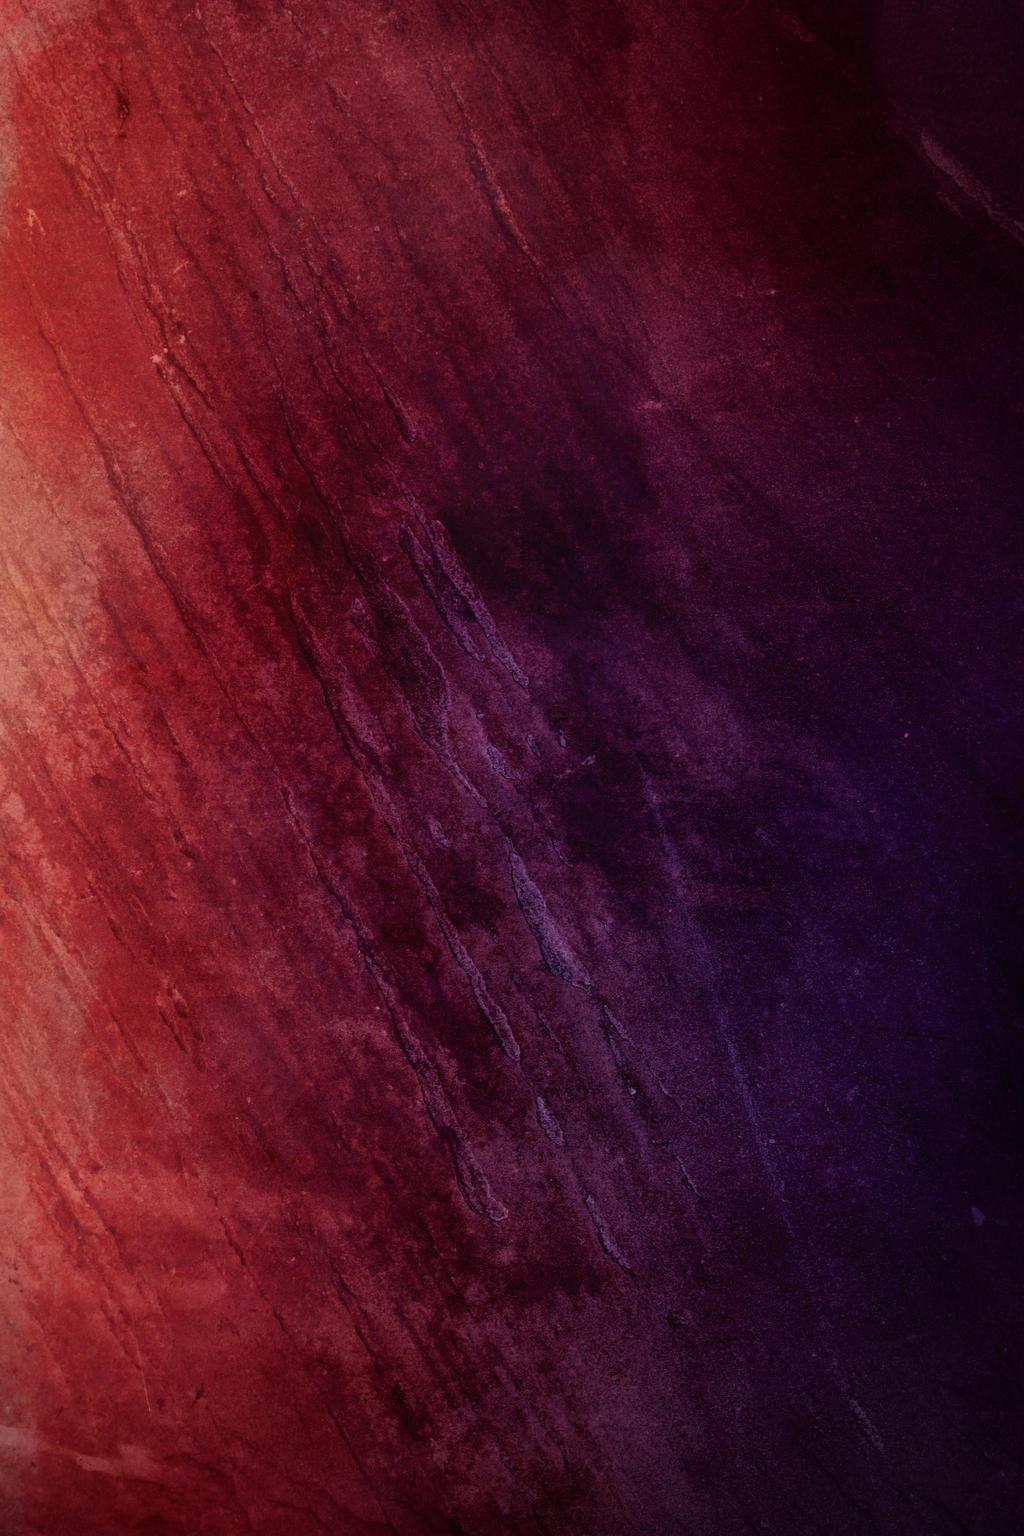 http://fc00.deviantart.net/fs71/i/2014/037/b/5/digital_art_texture_84_by_mercurycode-d756n3v.jpg